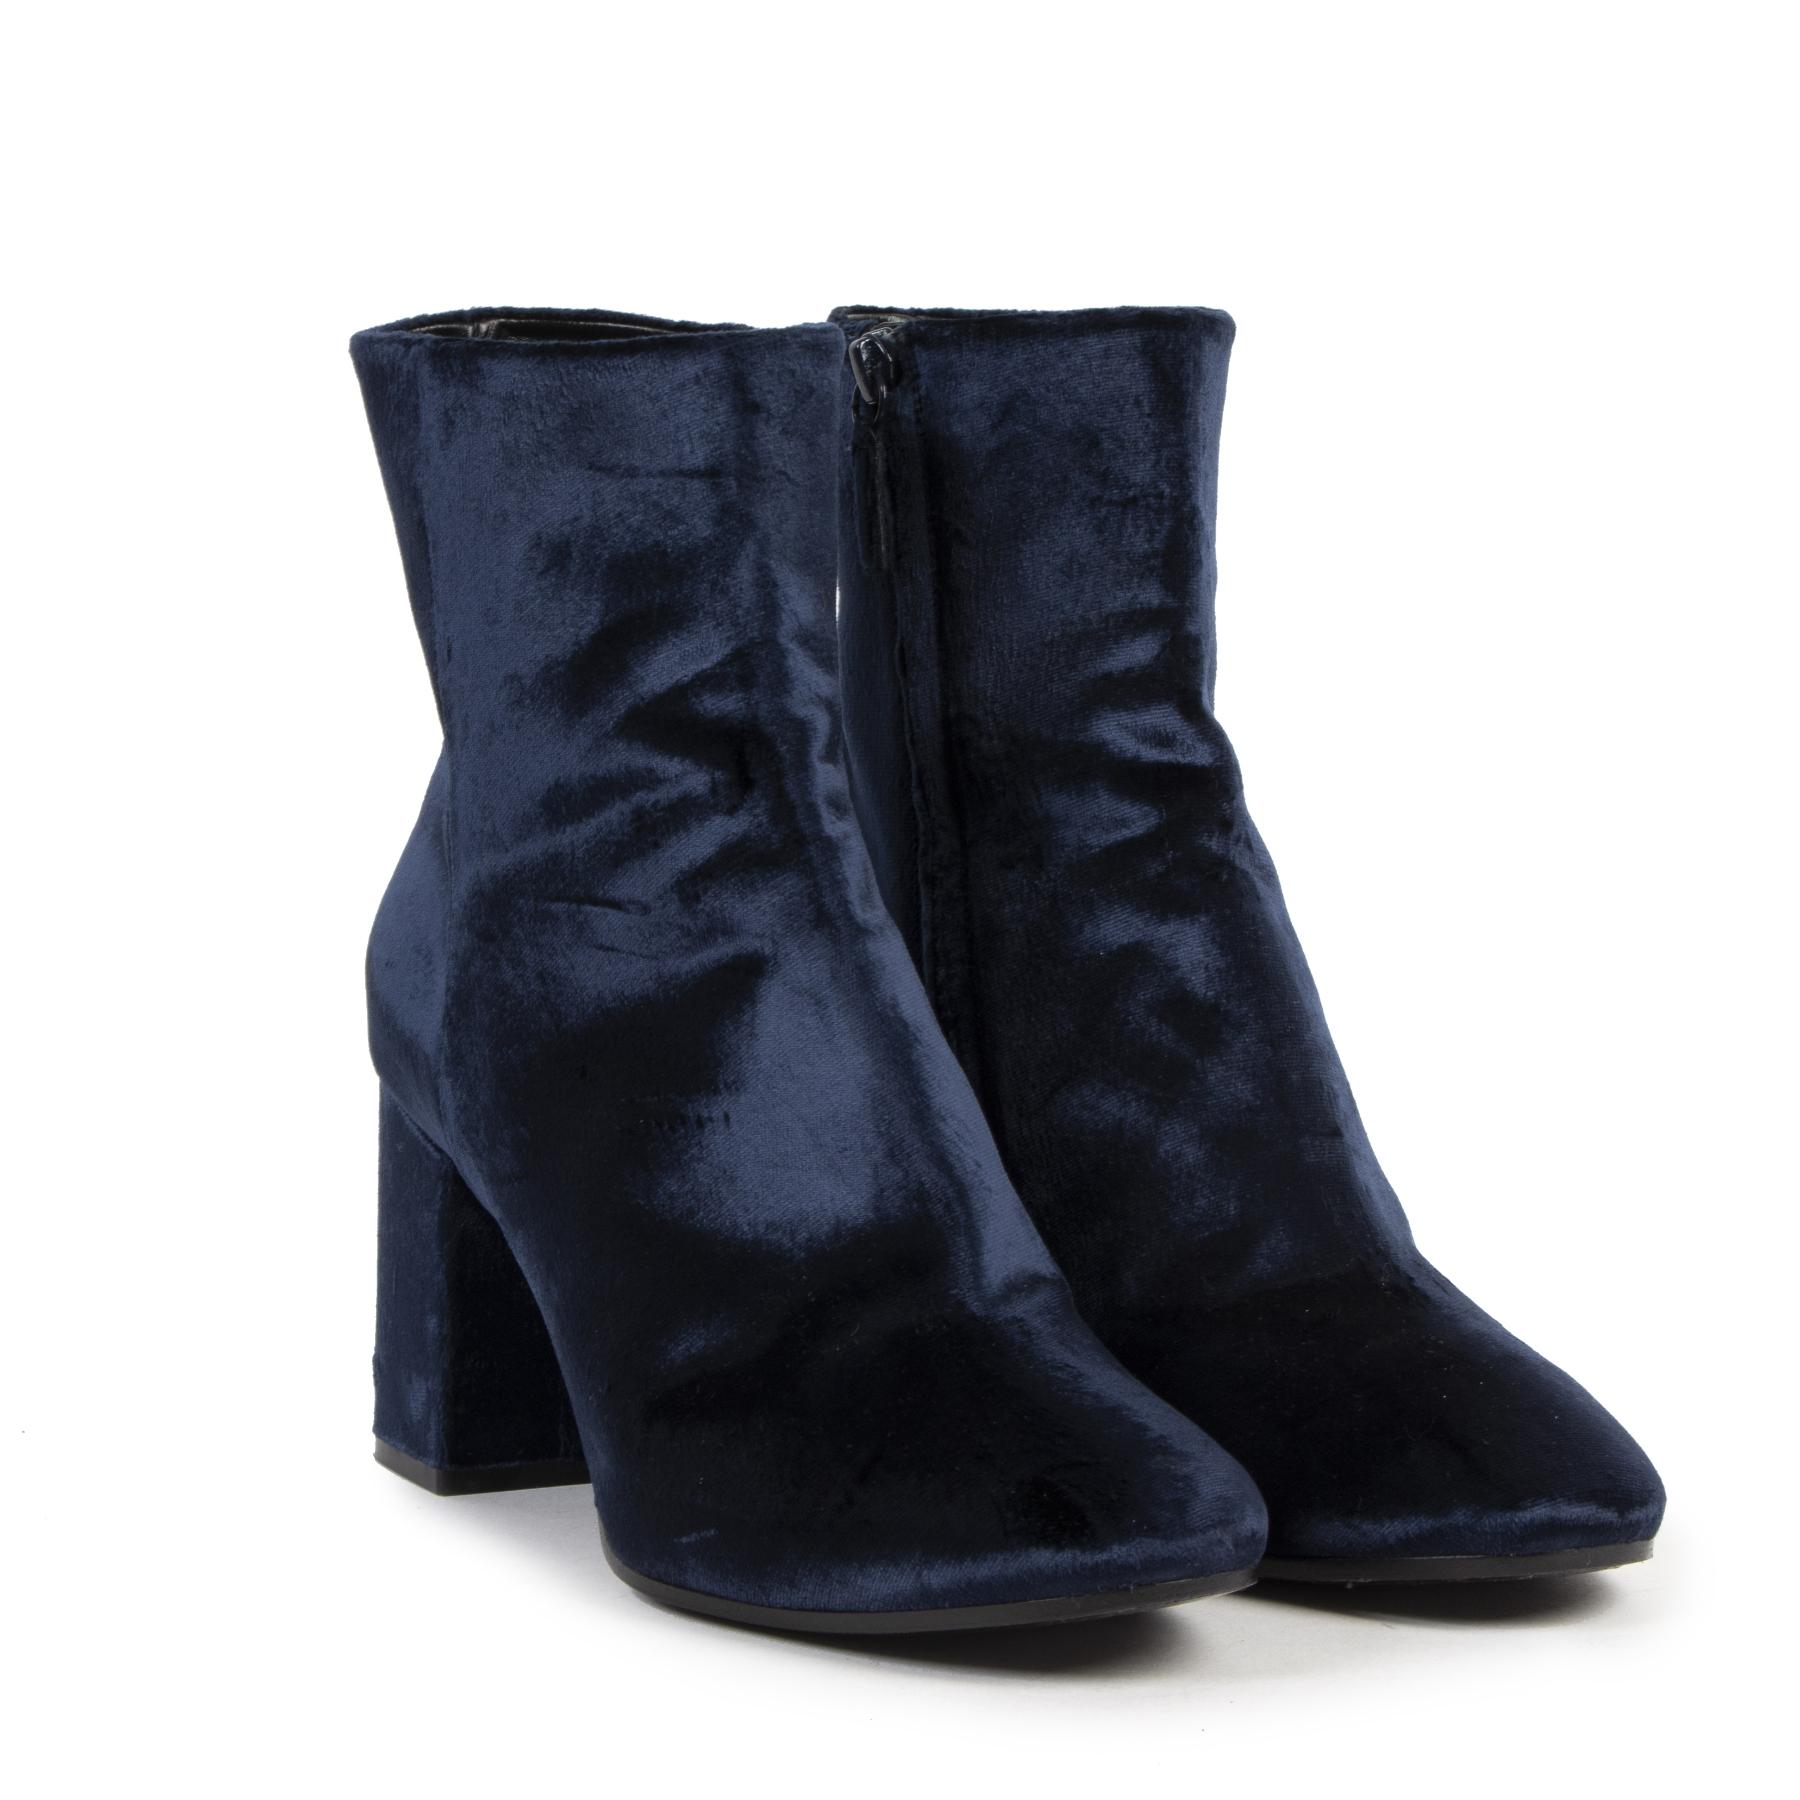 Authentieke tweedehands vintage Balenciaga Blue Velvet Ankle Boots - Size 39,5  koop online webshop LabelLOV